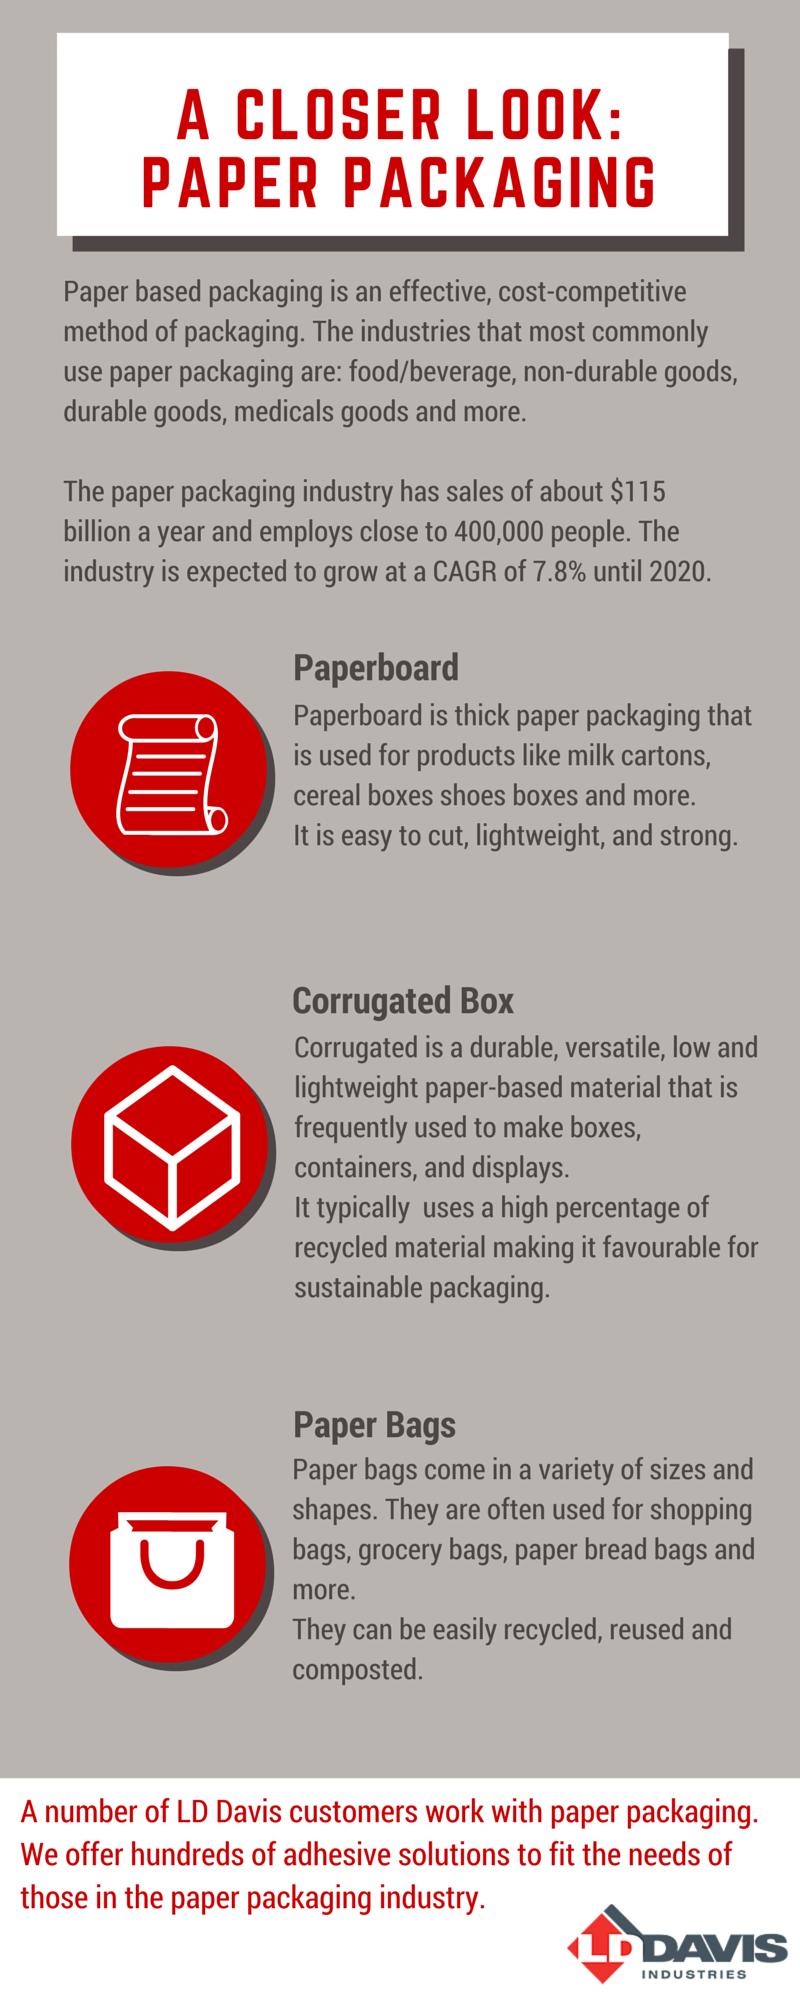 A Closer Look: Paper Packaging